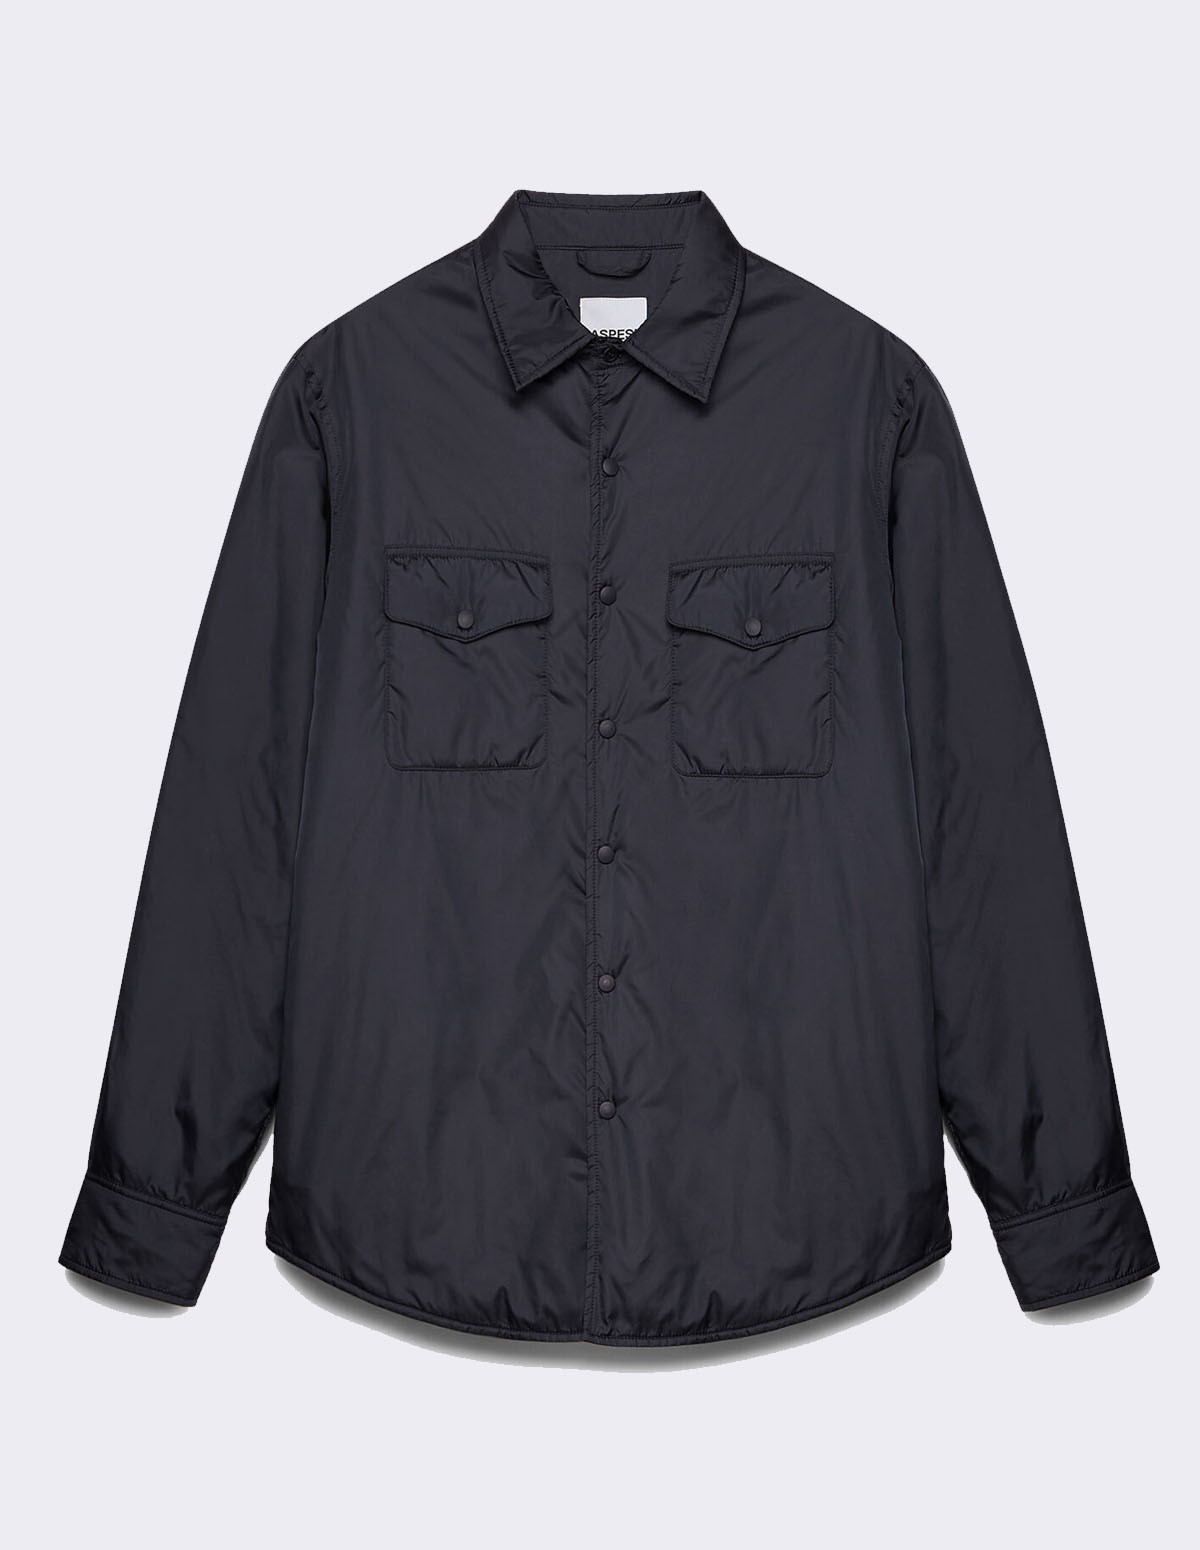 Aspesi Mod.13 Shirt - NAVY